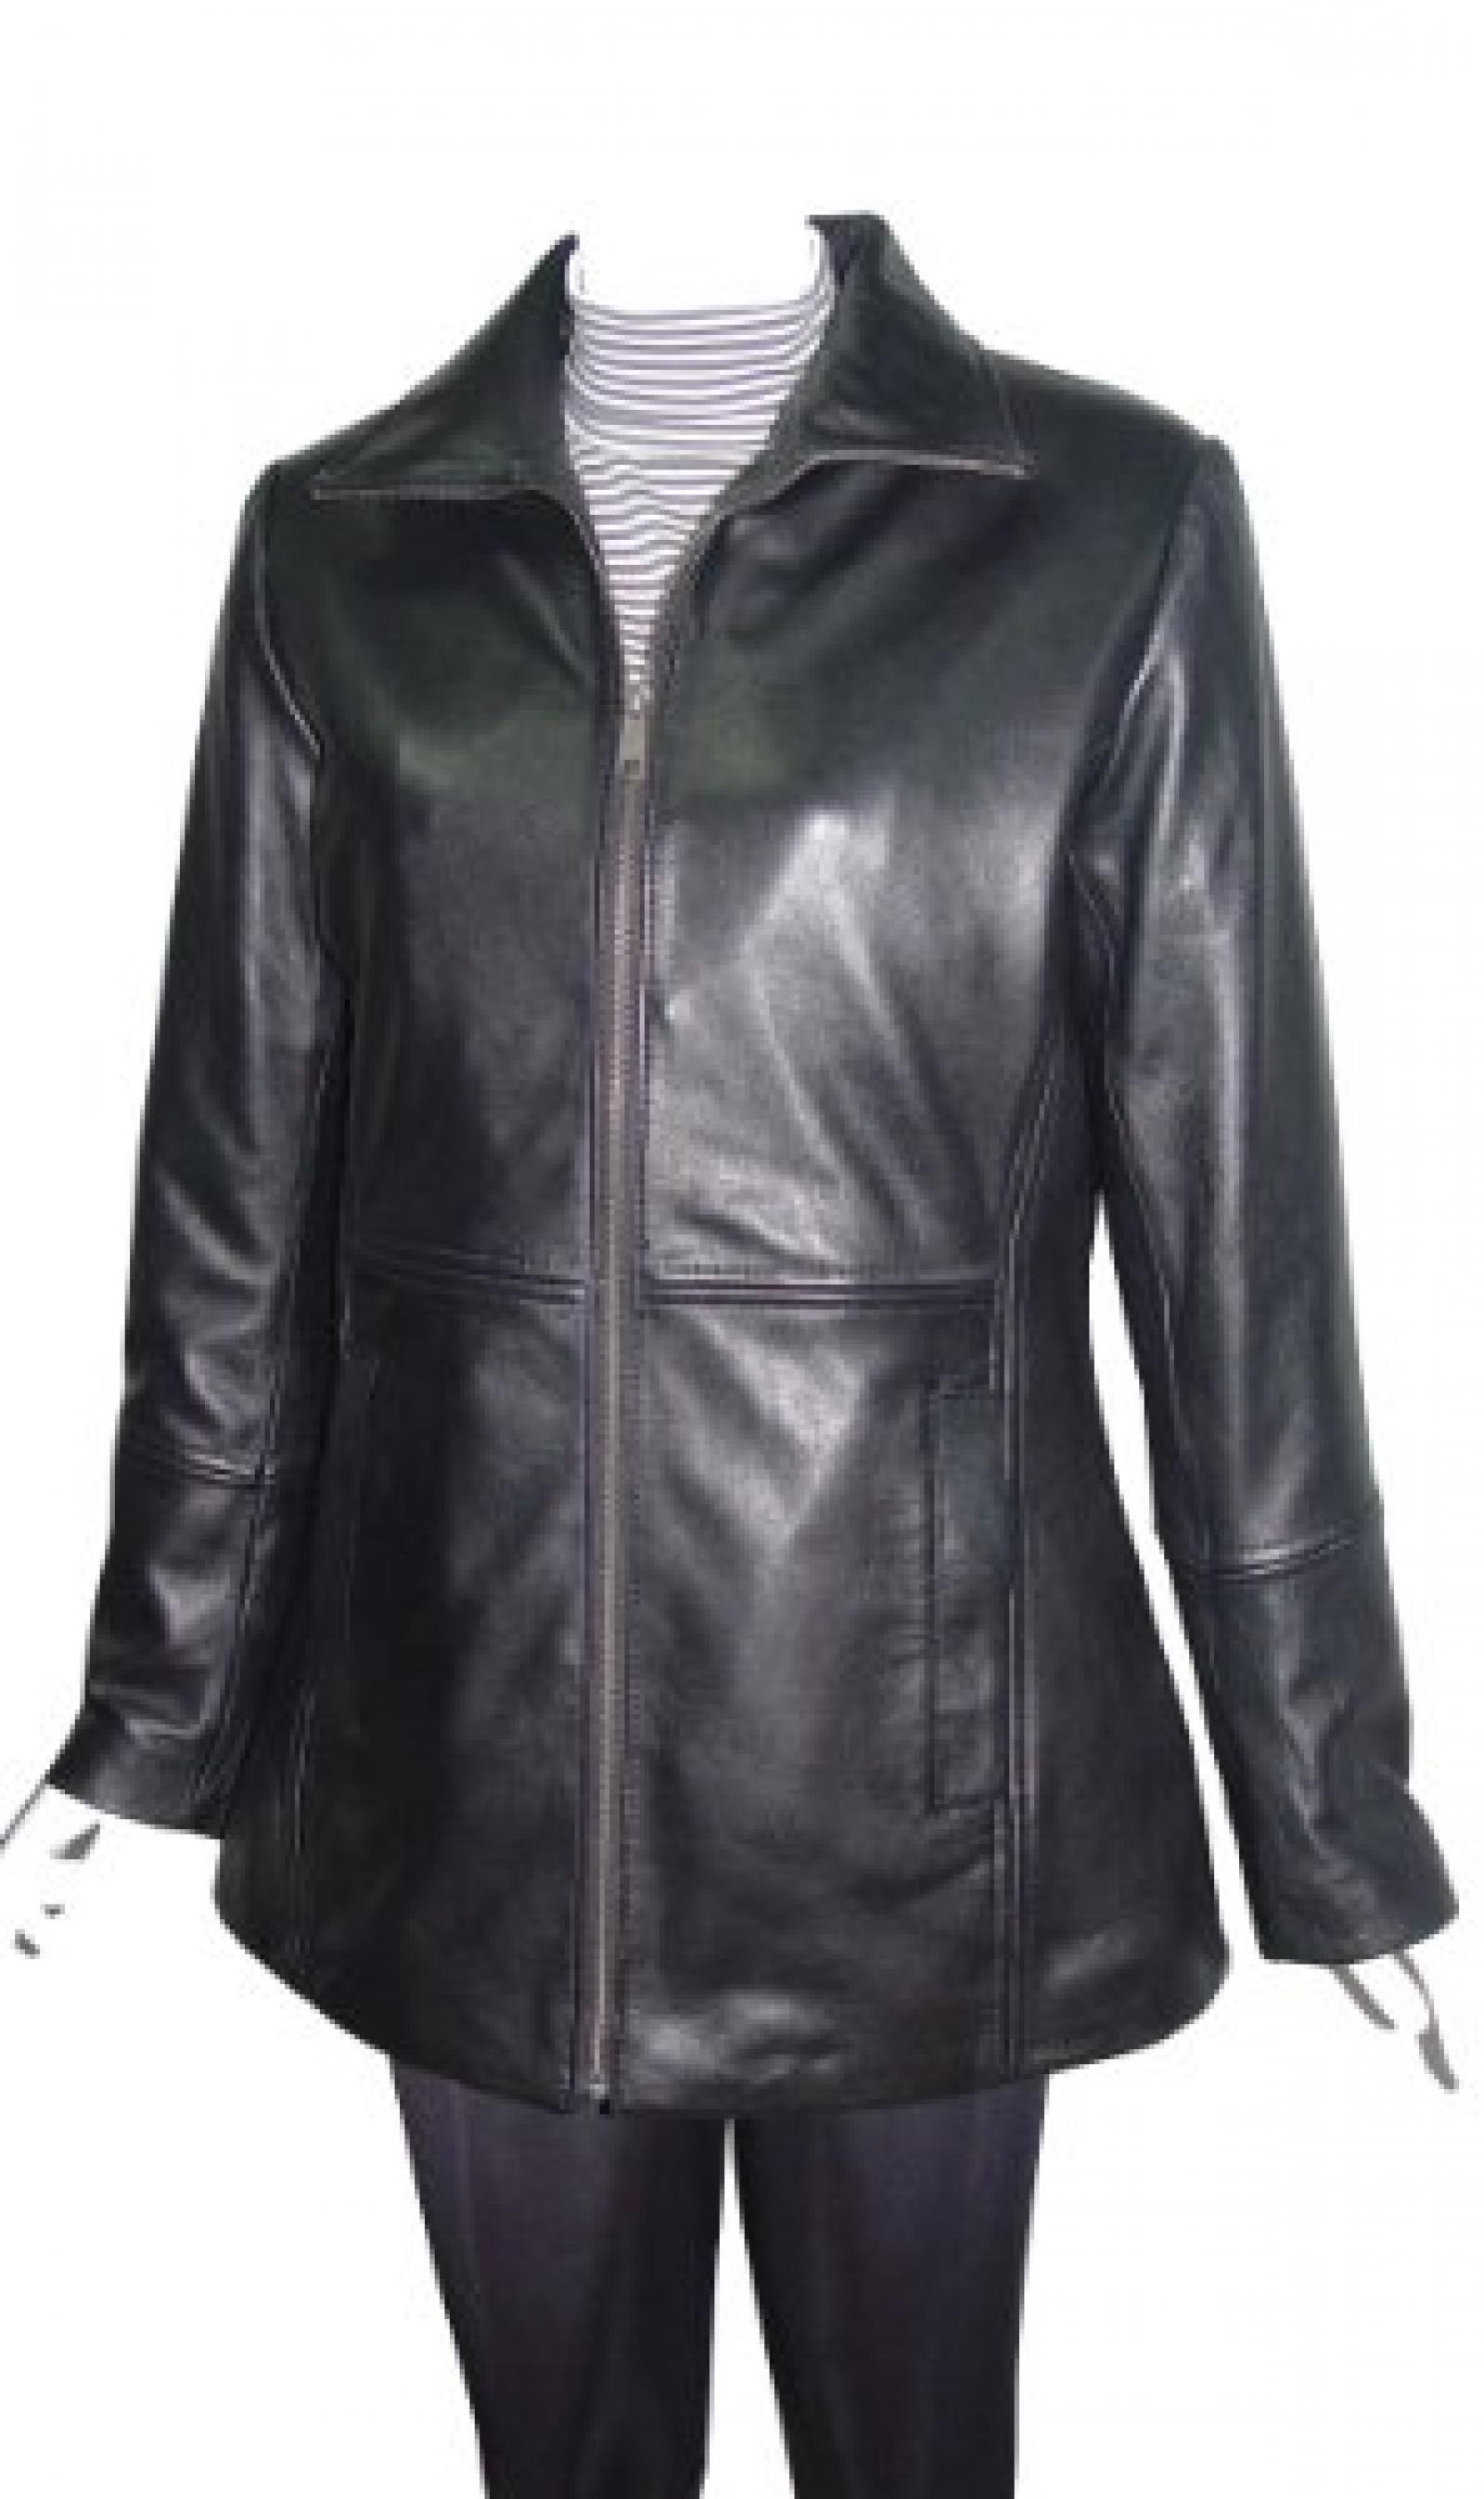 Nettailor Women PETITE SZ 4186 Soft Leather Simple Easy Casual Long Jacket